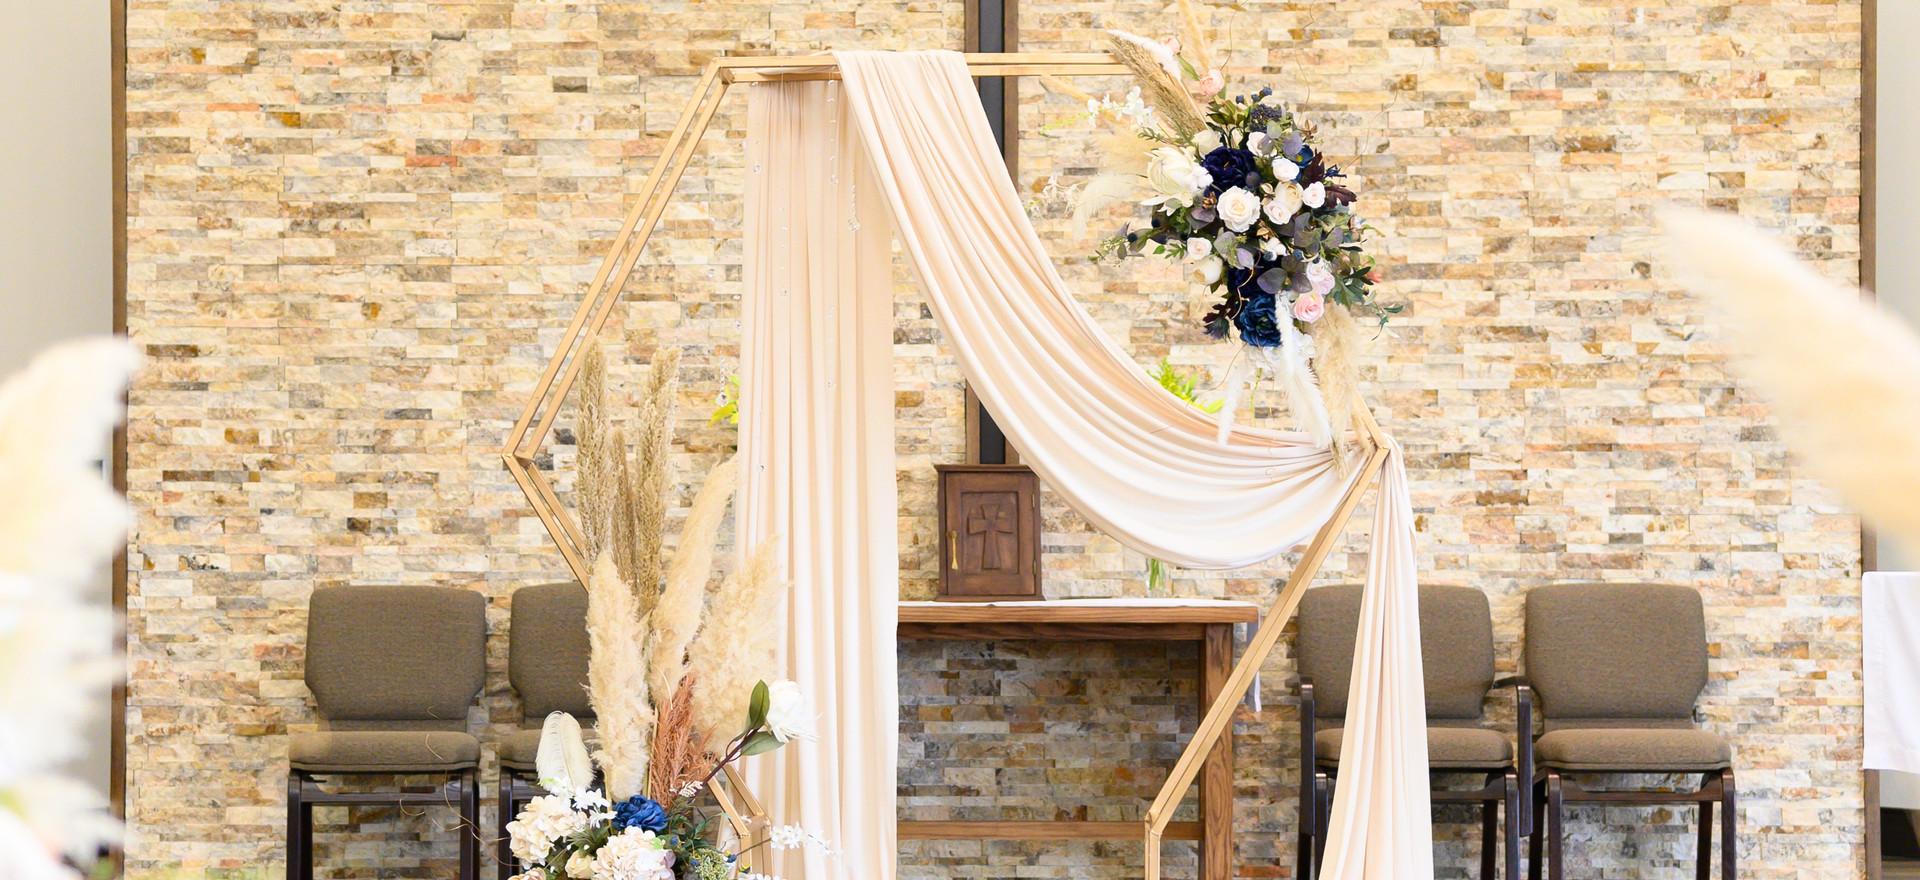 029_Lorena and Mike's Wedding day.jpg